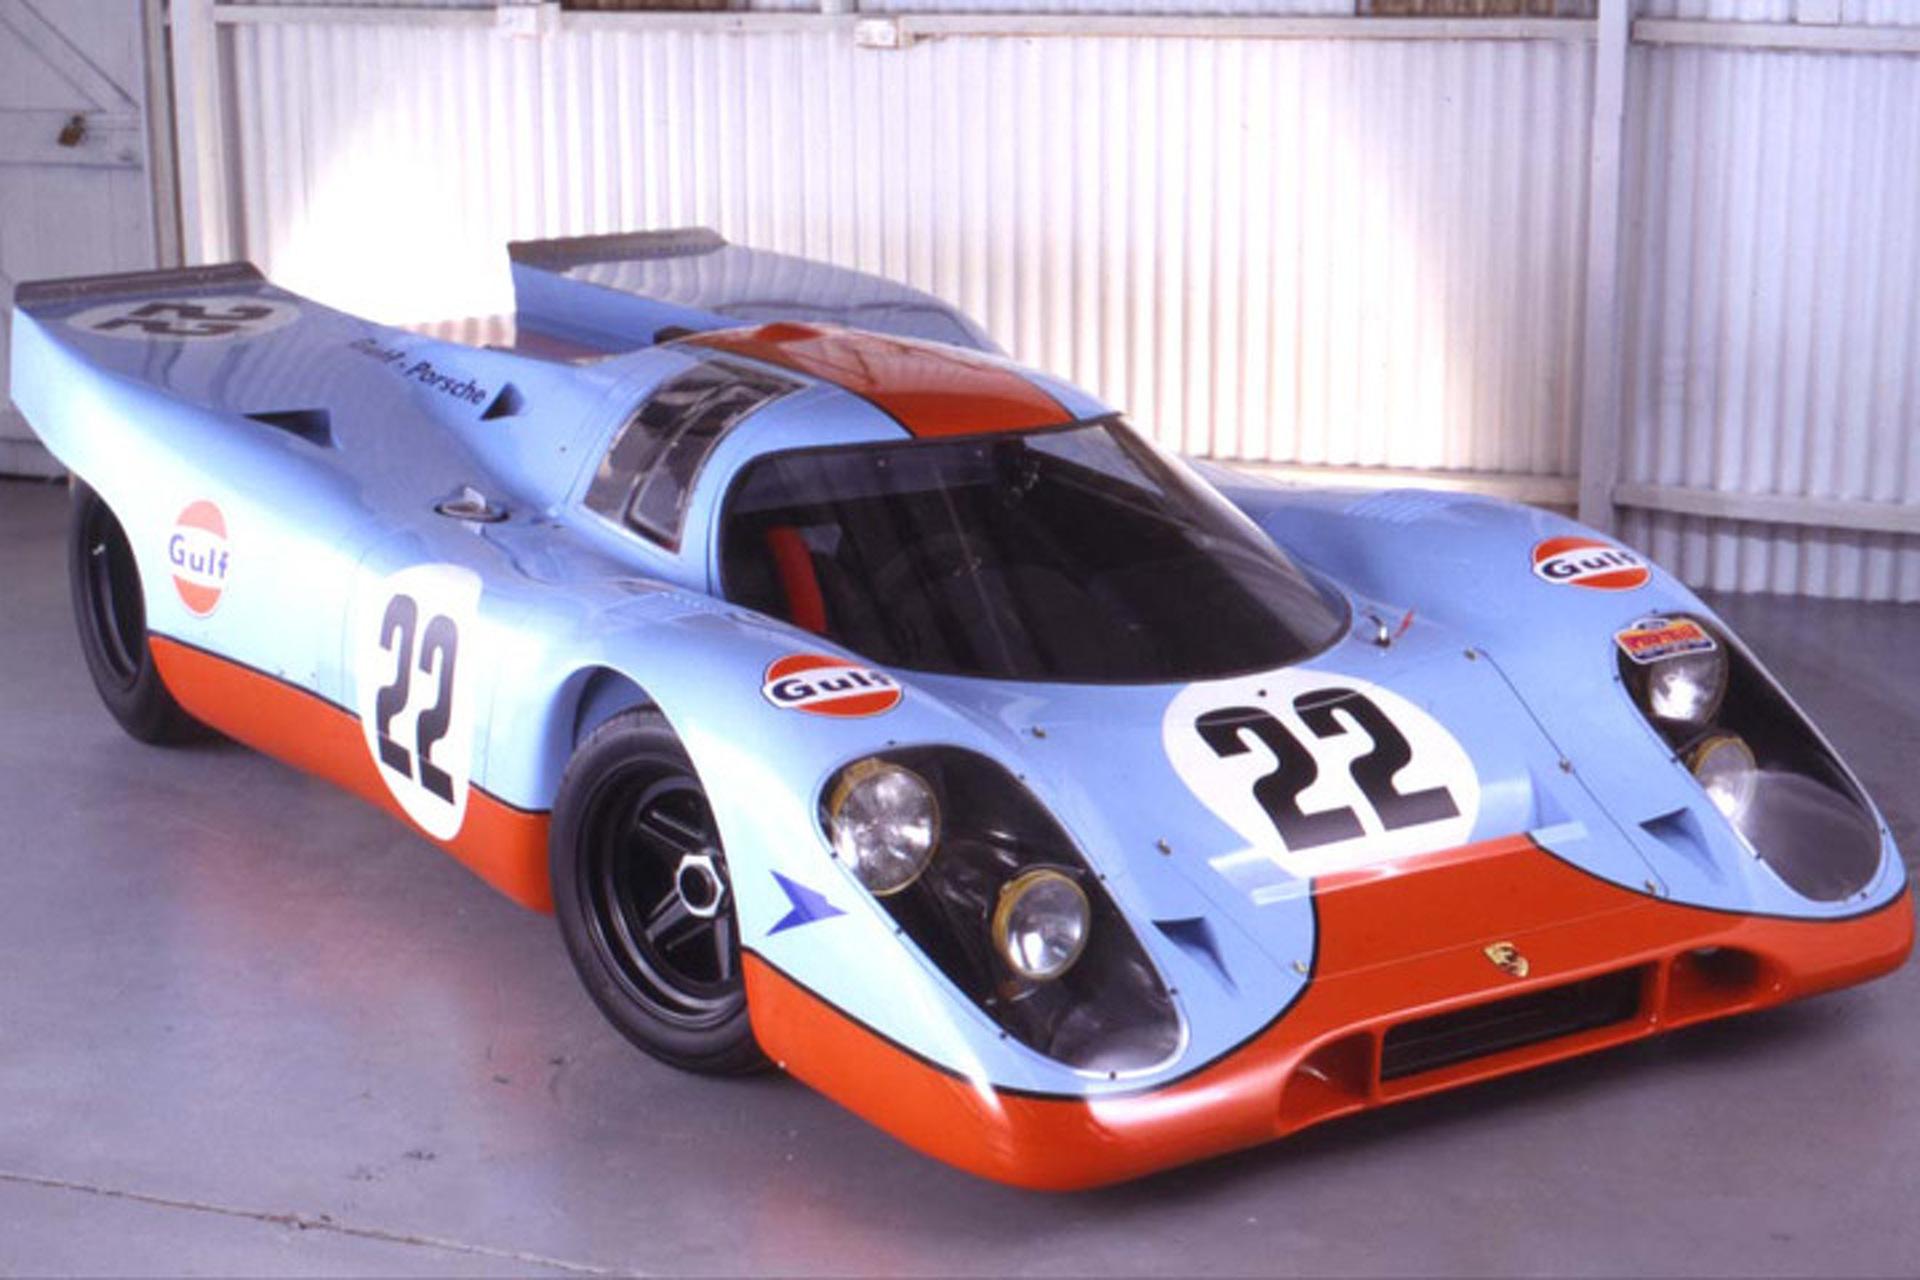 Across the Block: #22 Gulf Porsche 917 from Le Mans Film